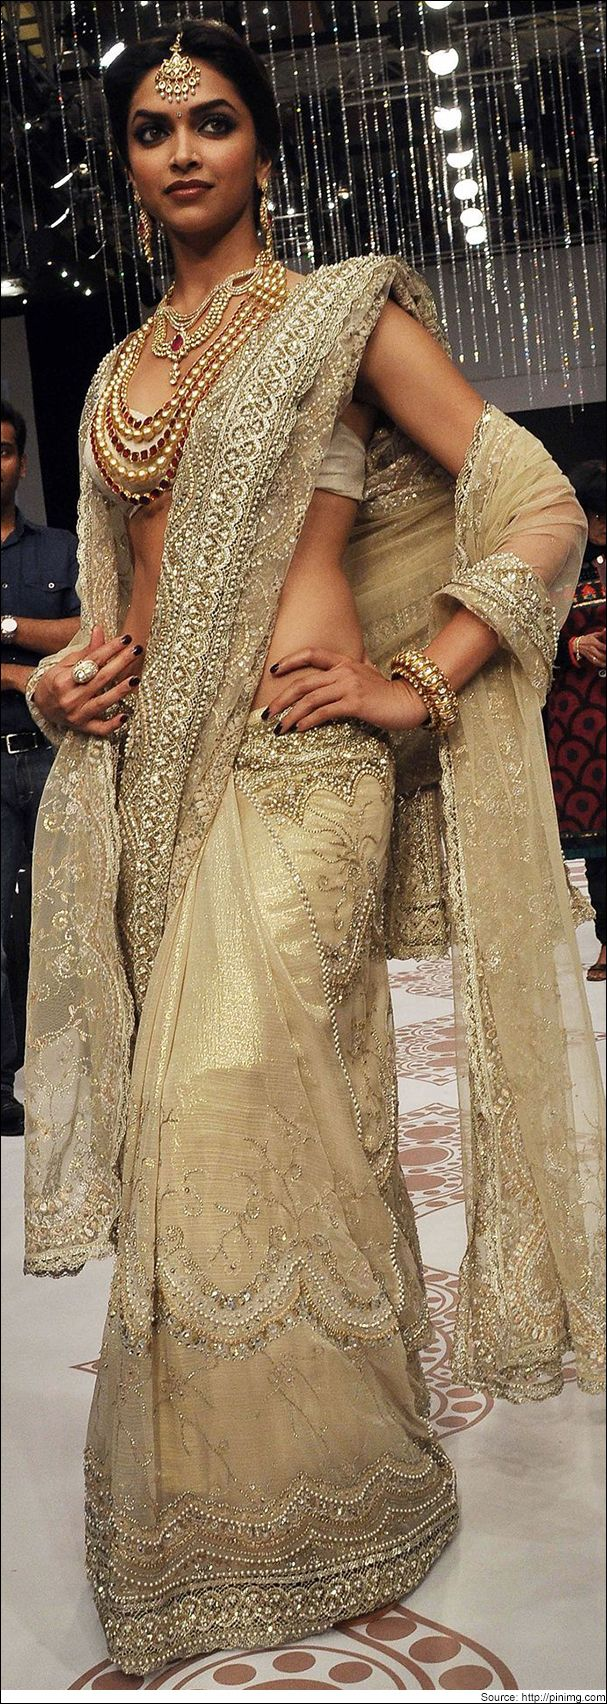 The Seductress Deepika Padukone in Sarees Let's bring back ...